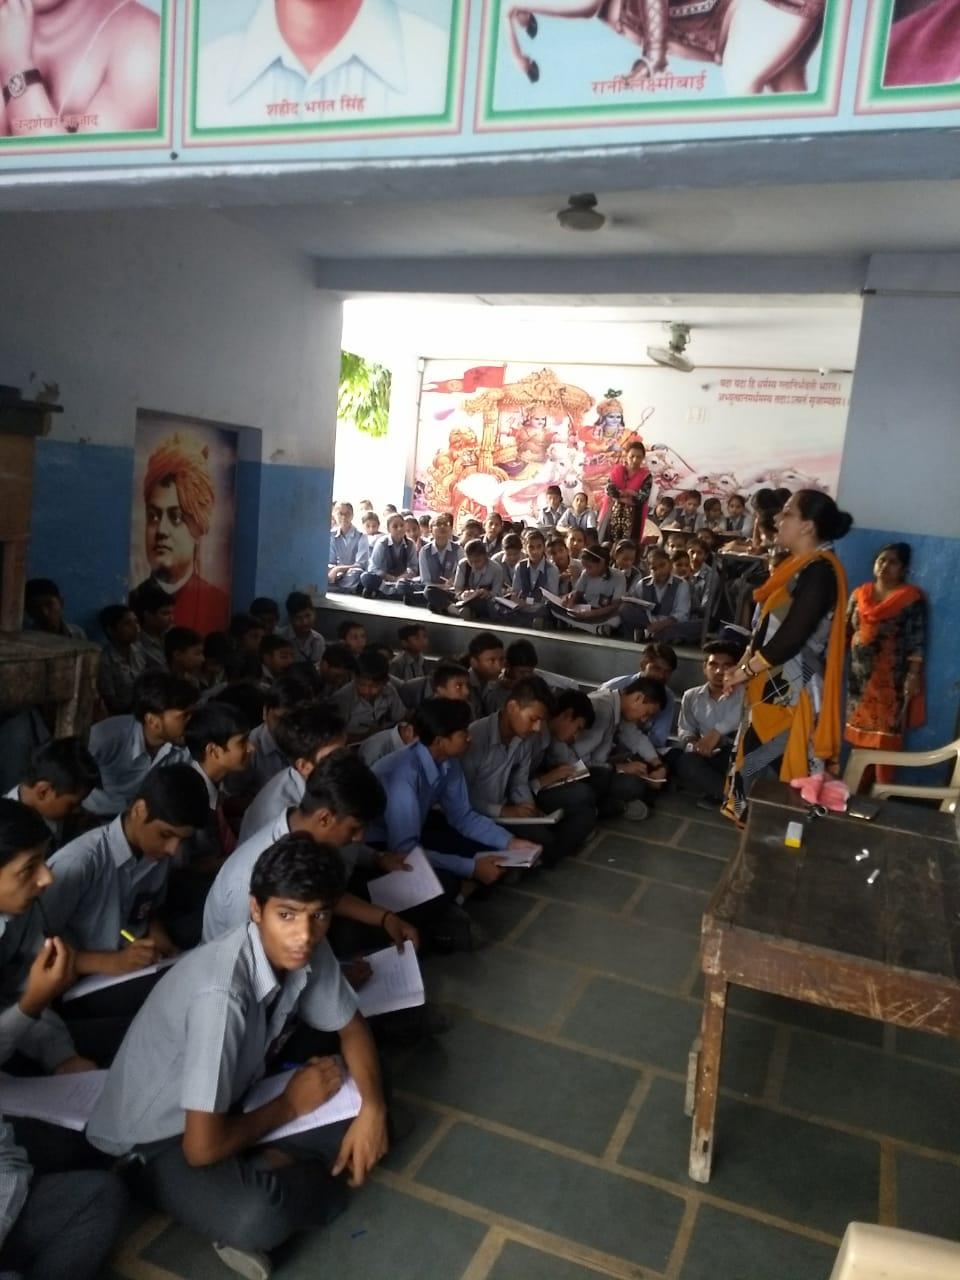 Lather public school  Karnal.jpeg